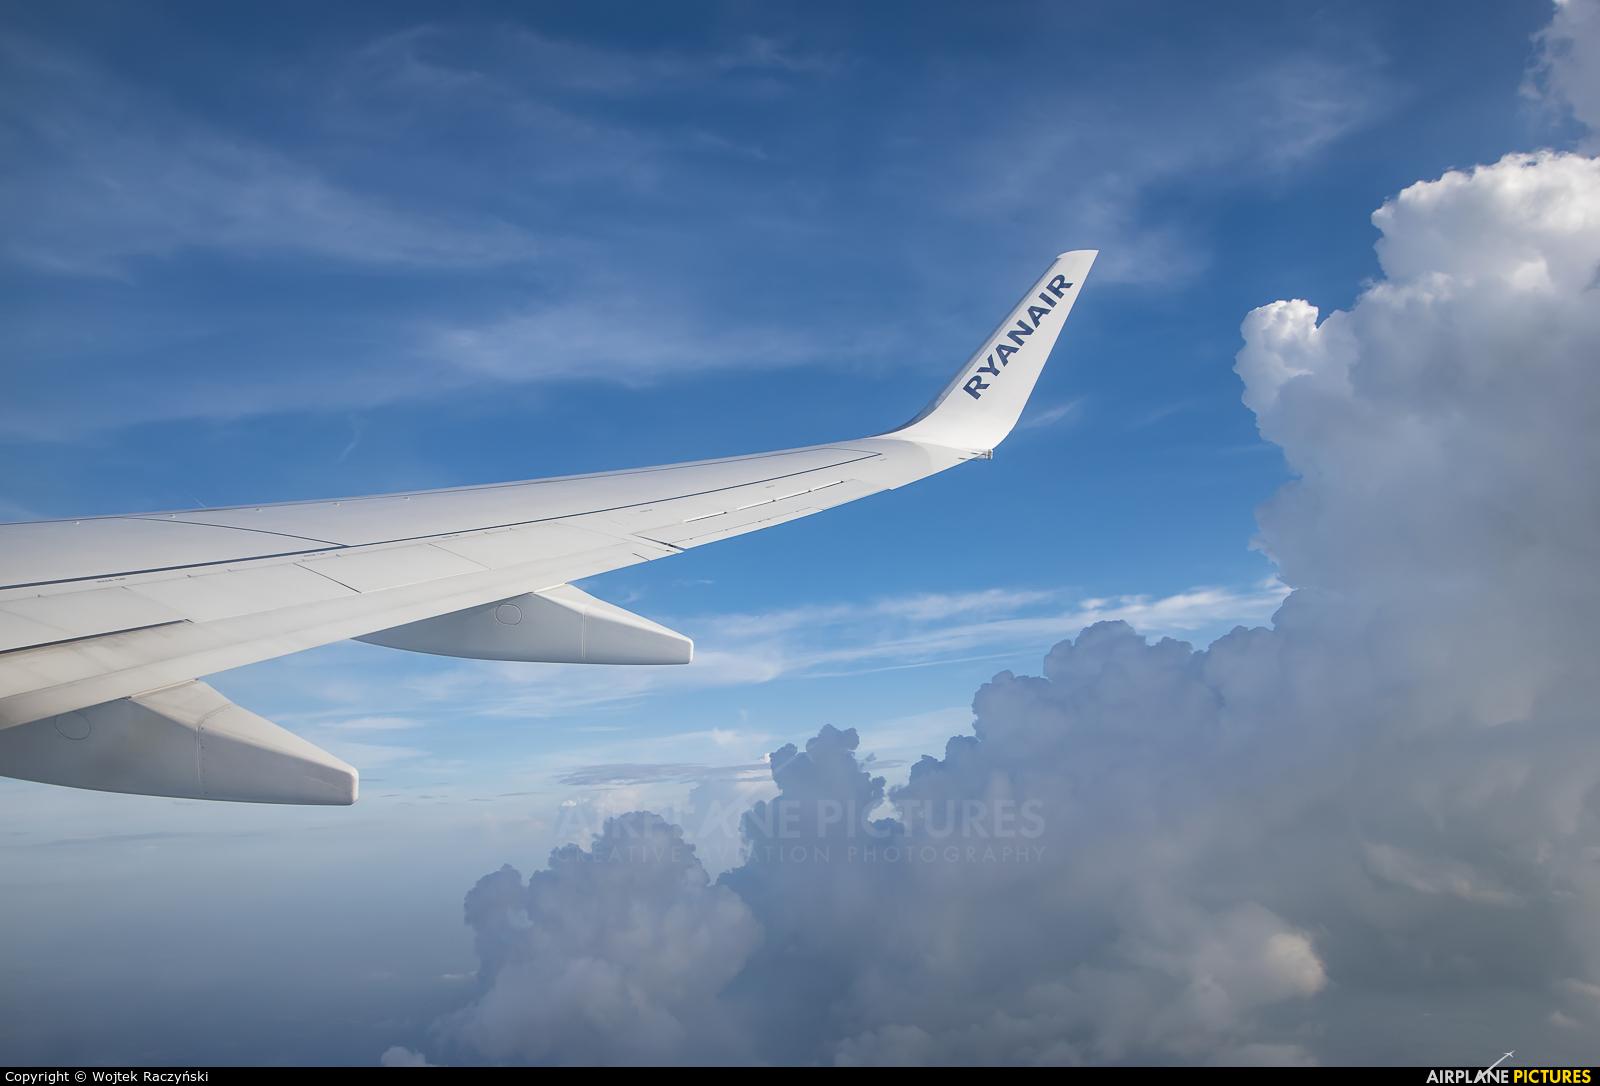 Ryan Air EI-FZH aircraft at In Flight - Germany